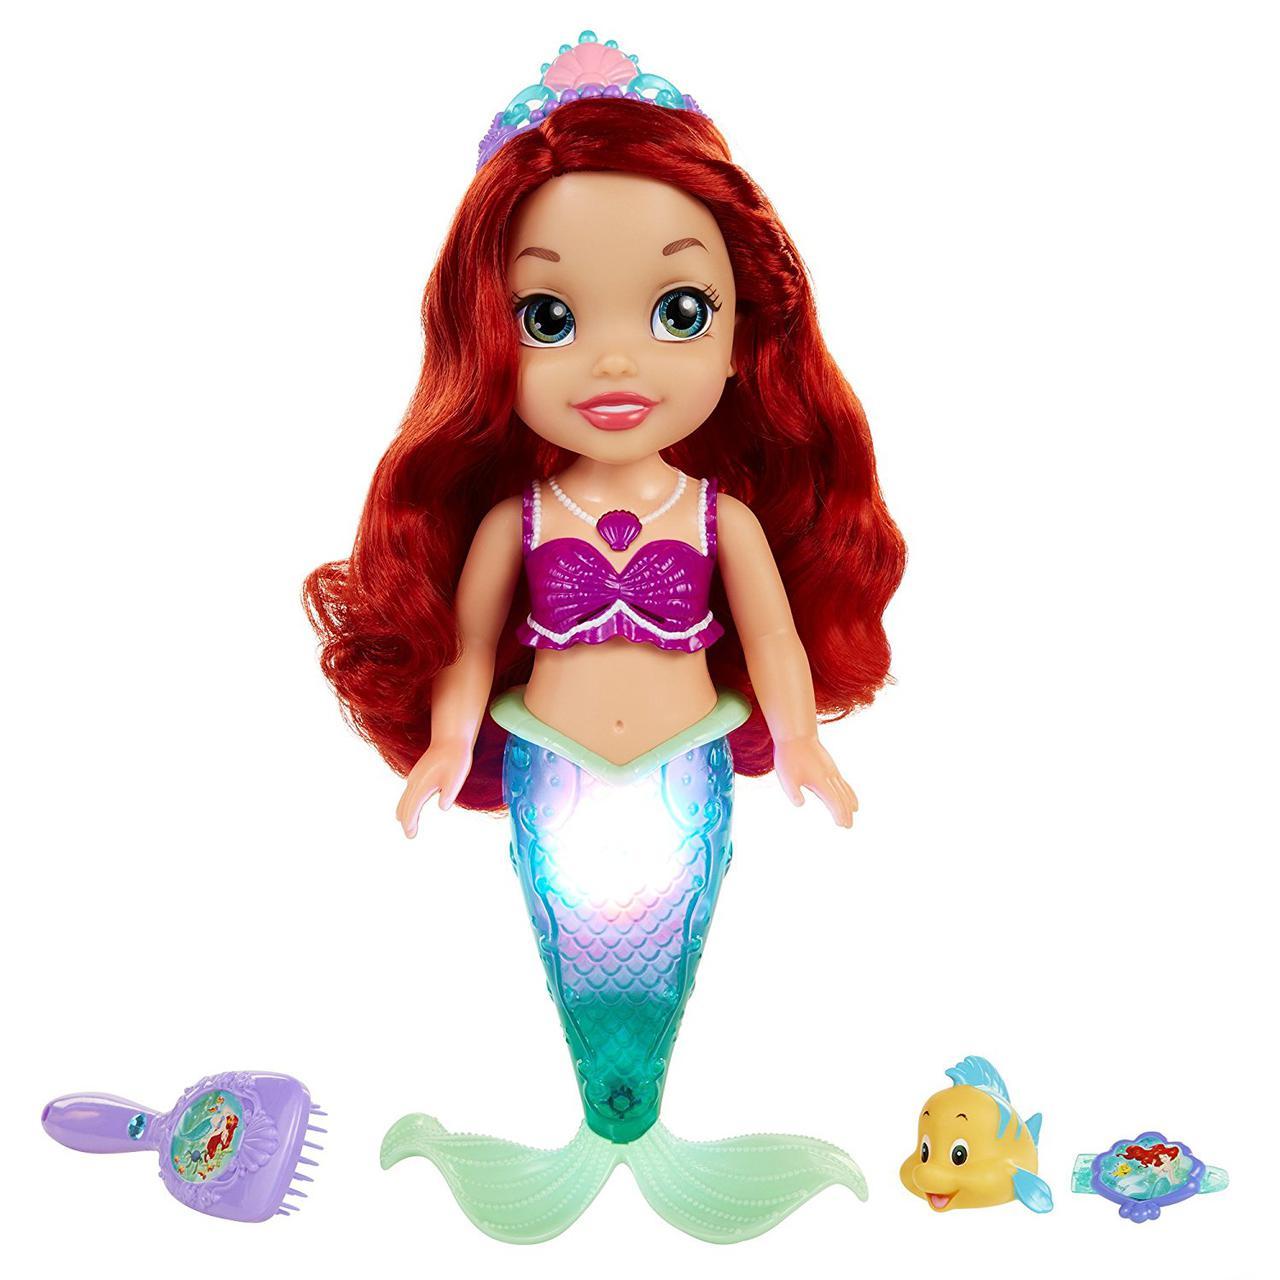 Кукла Дисней Русалка поющая Ариэль Disney Princess Colors of The Sea Ariel with Bonus Hair Playpiece Doll